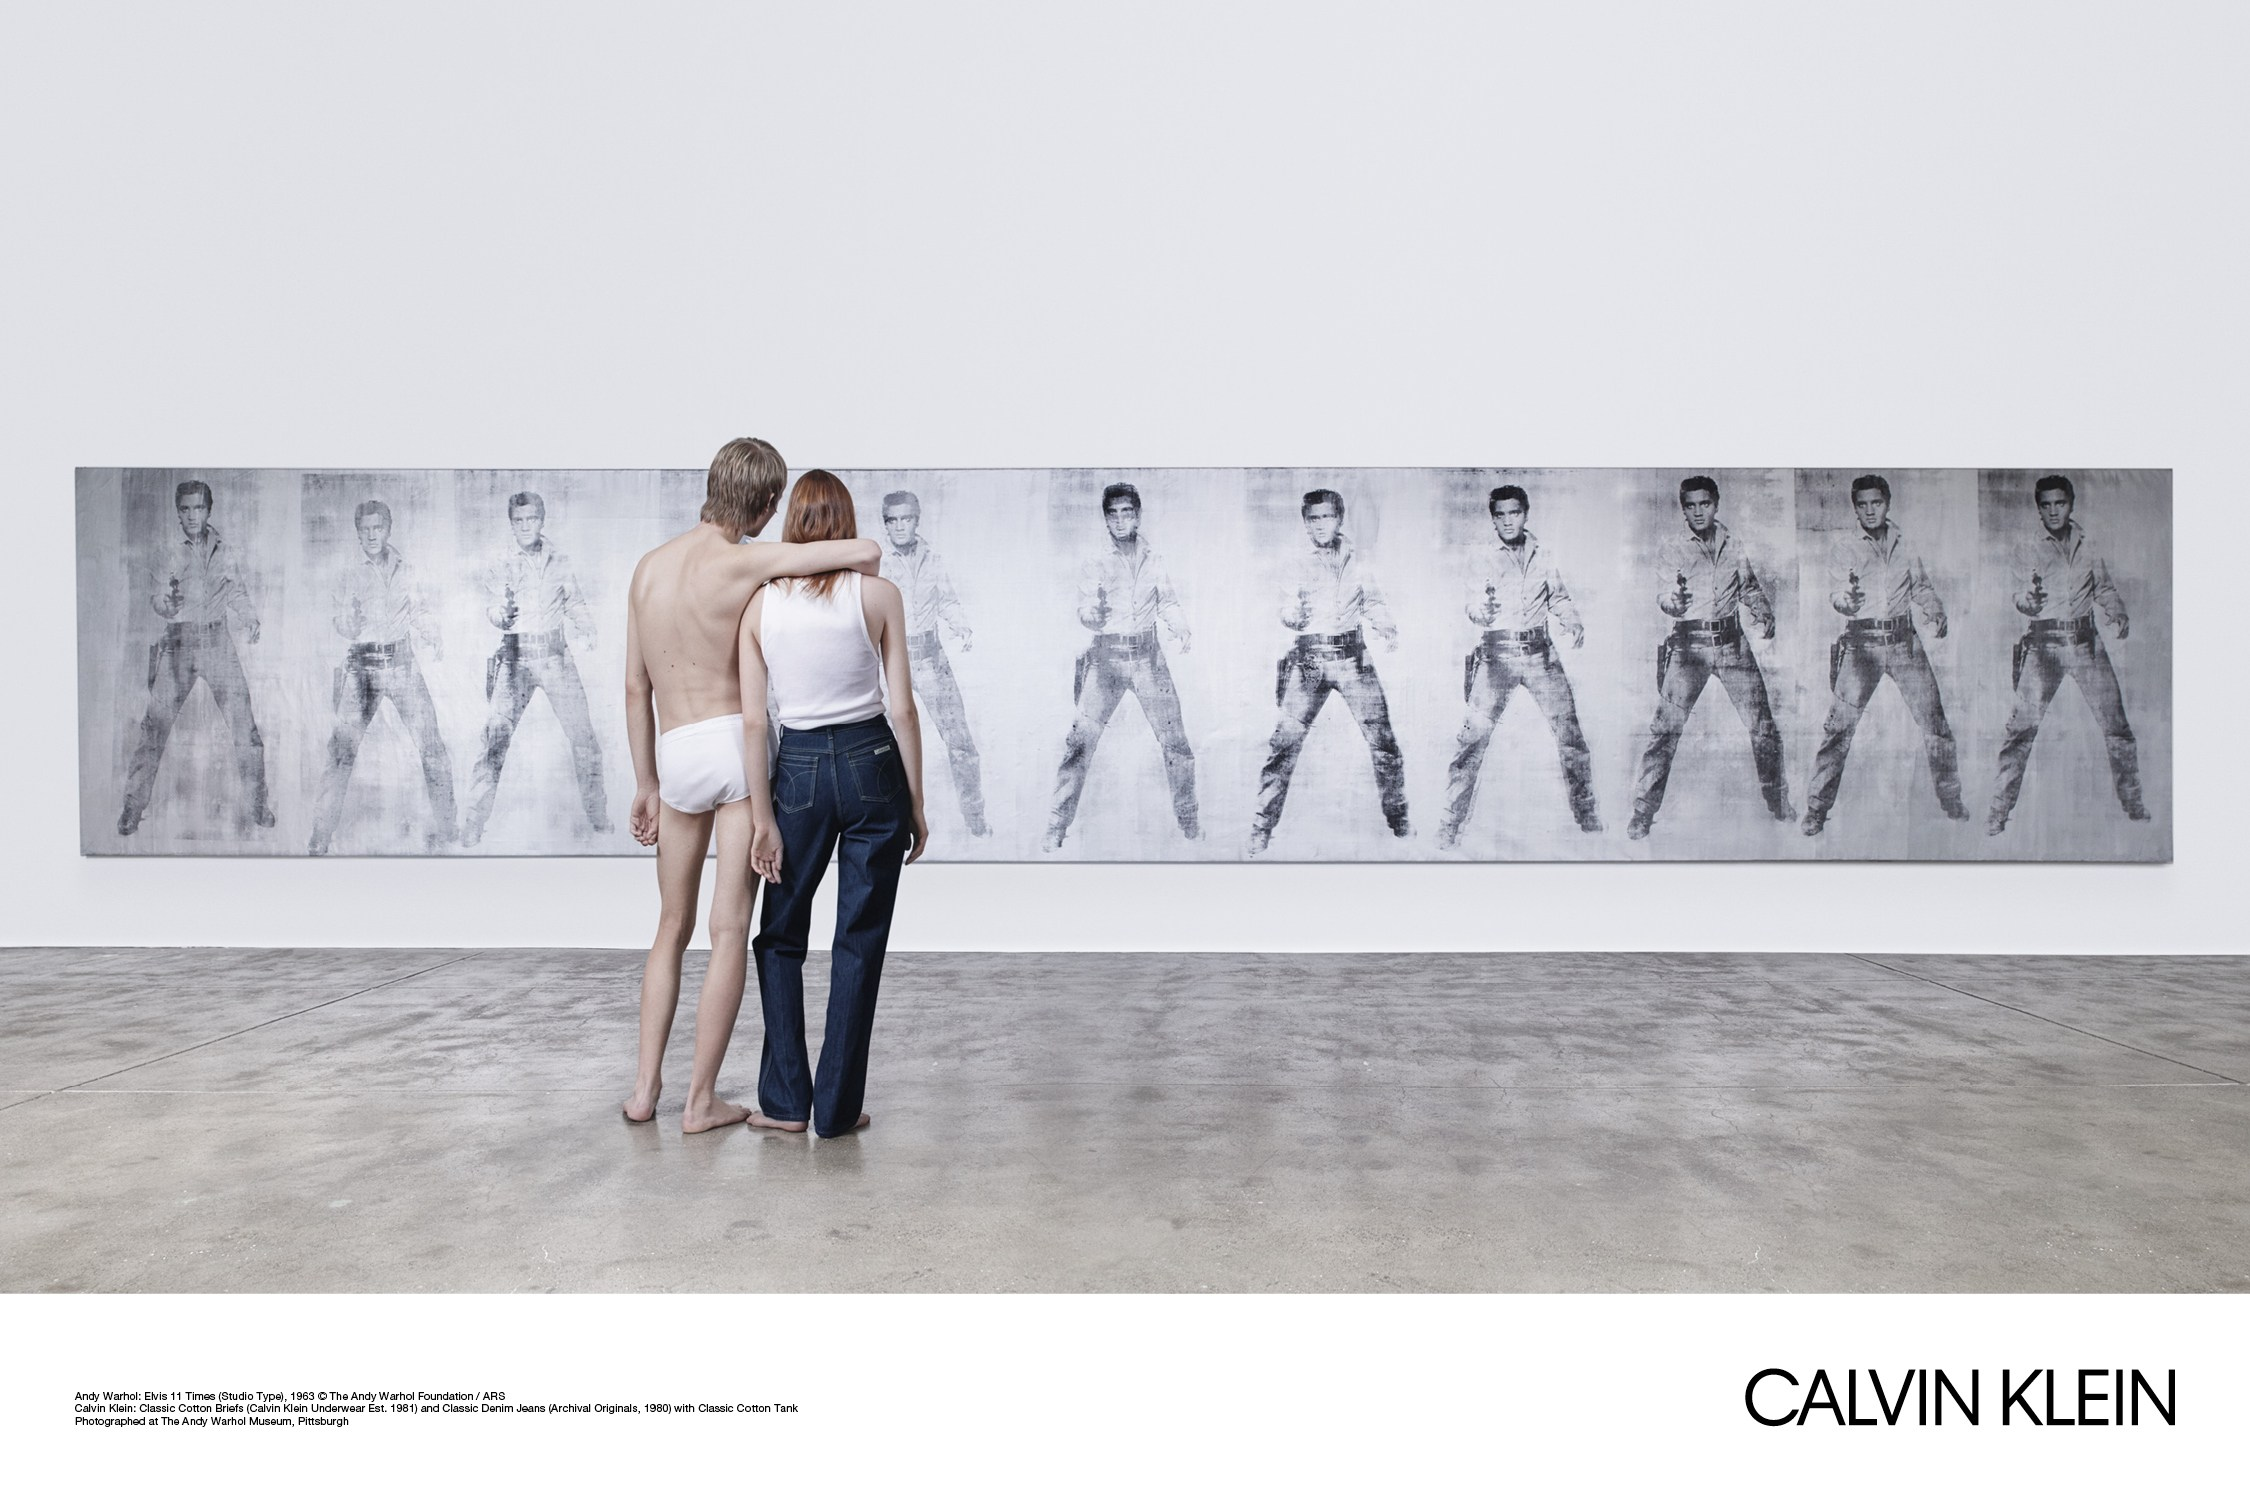 calvin-klein-campaign-s17-3.jpg